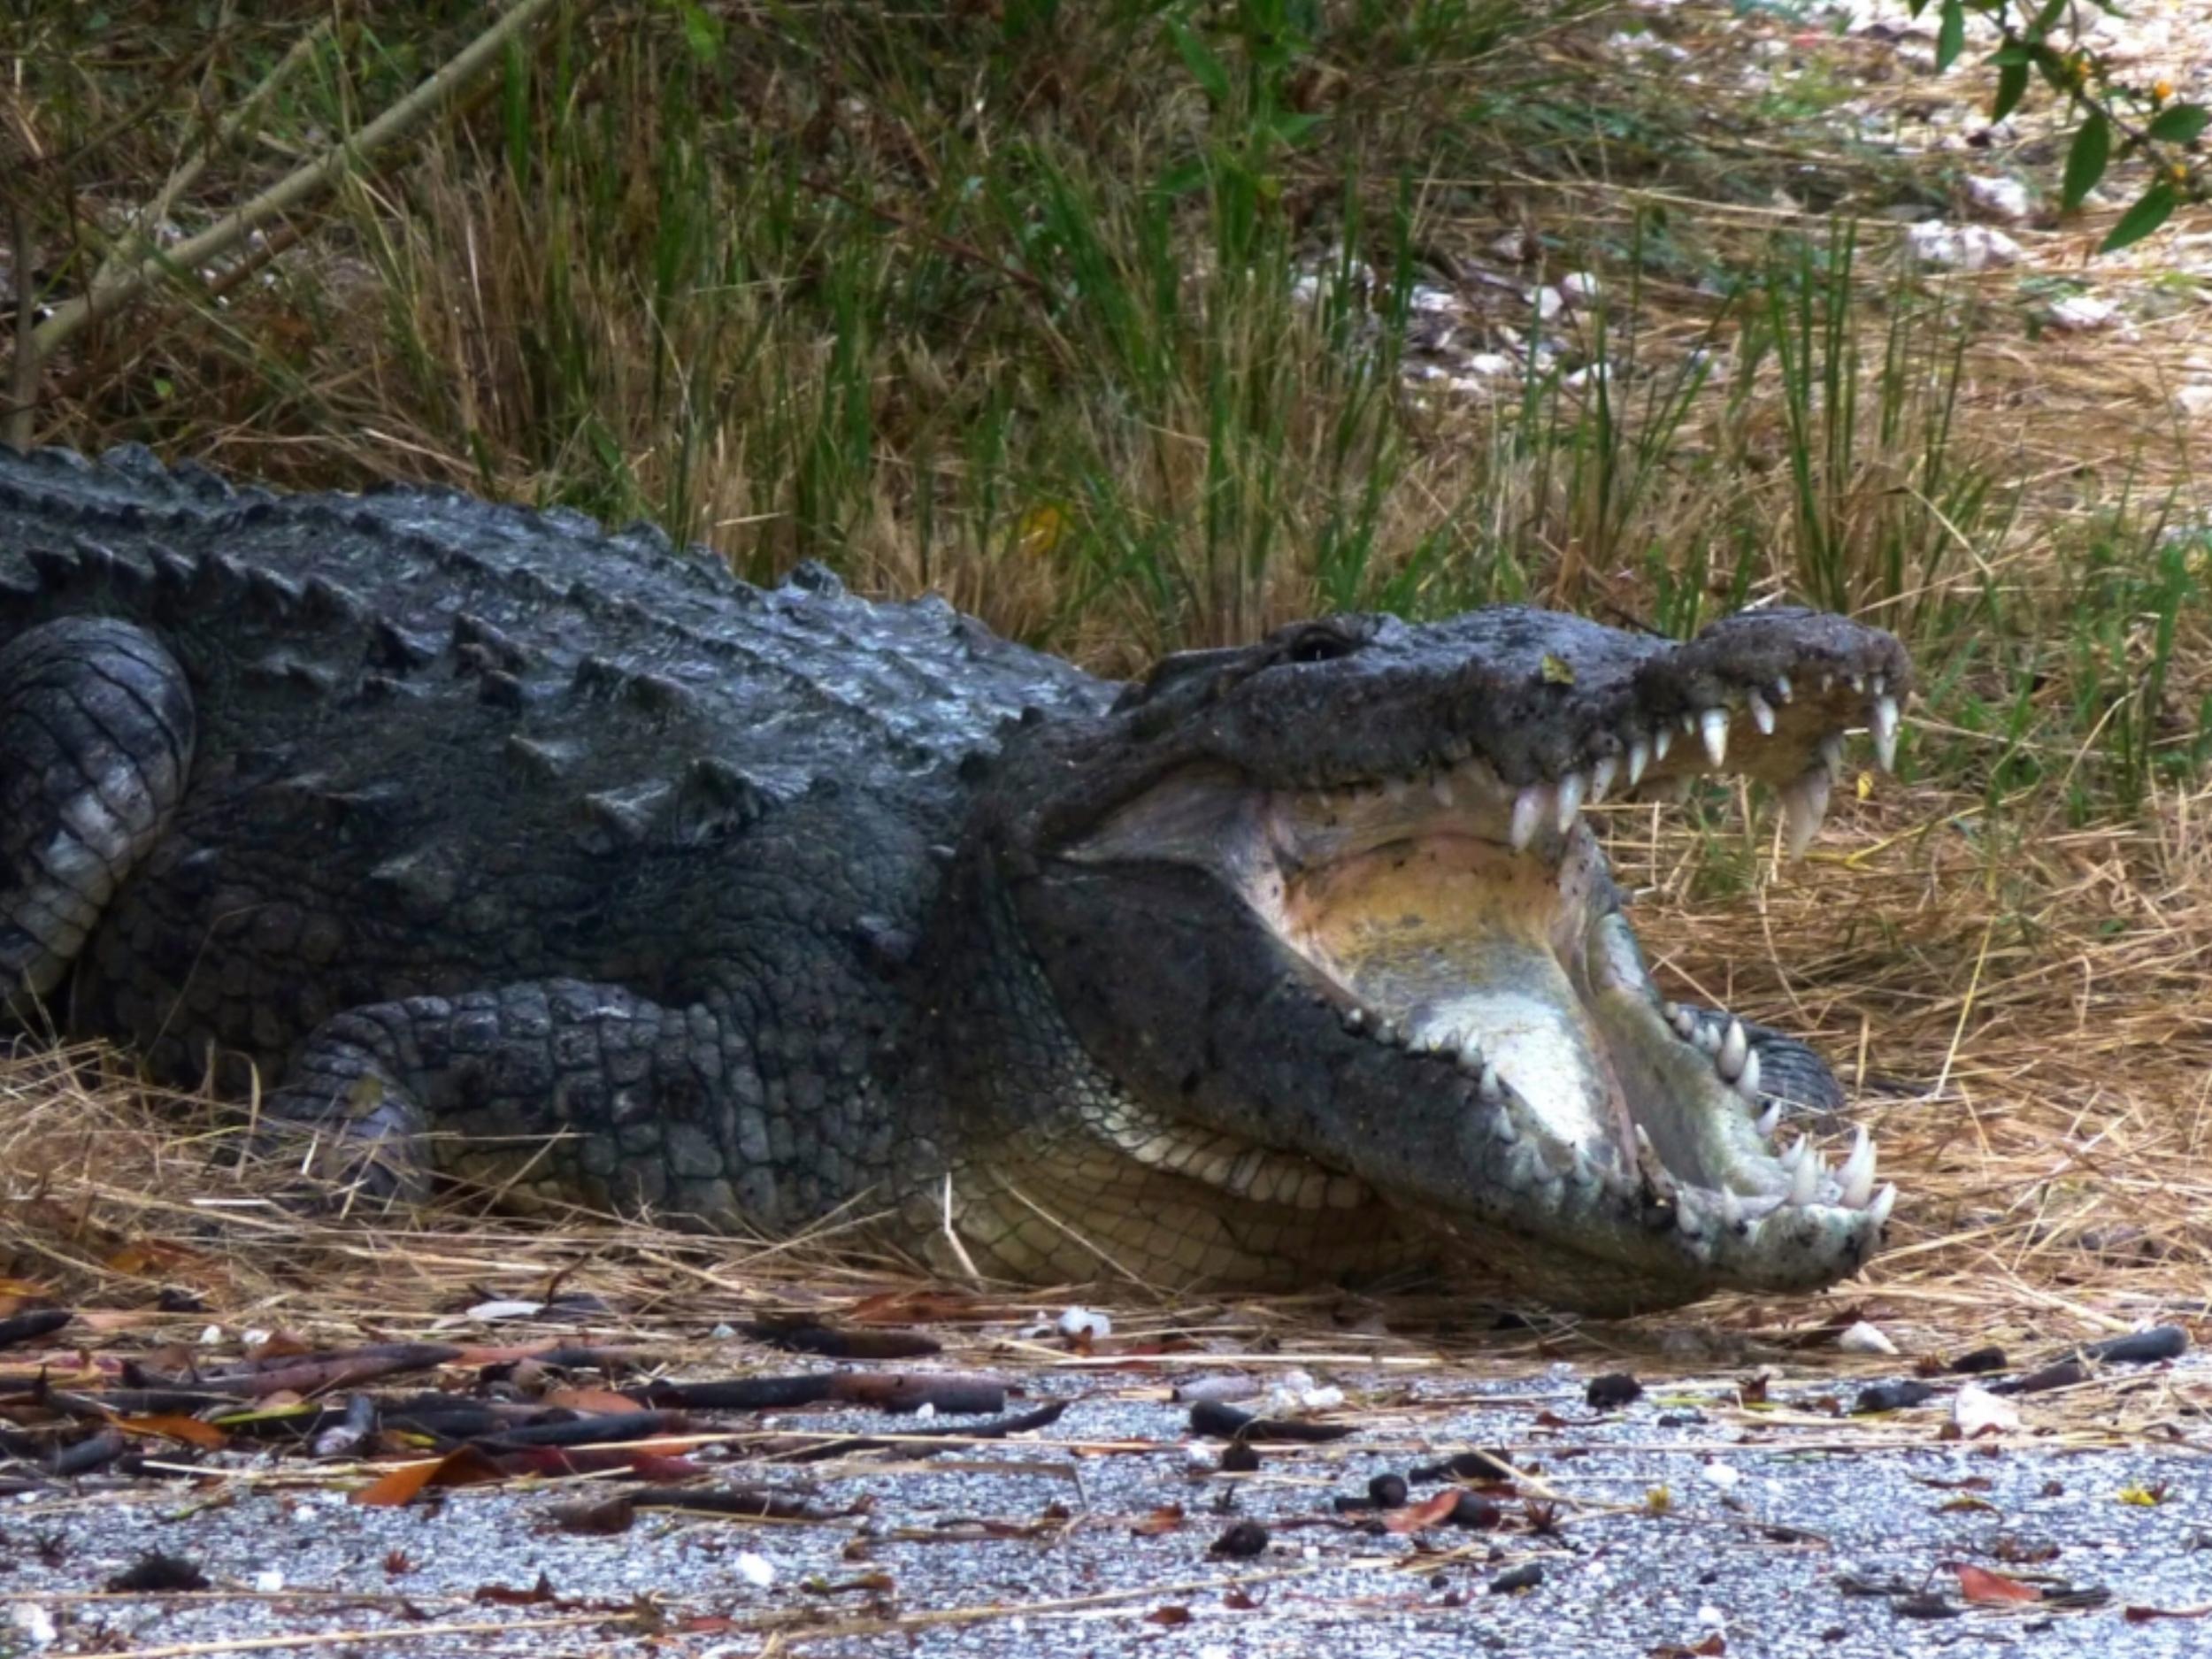 American Crocodile, Everglades National Park